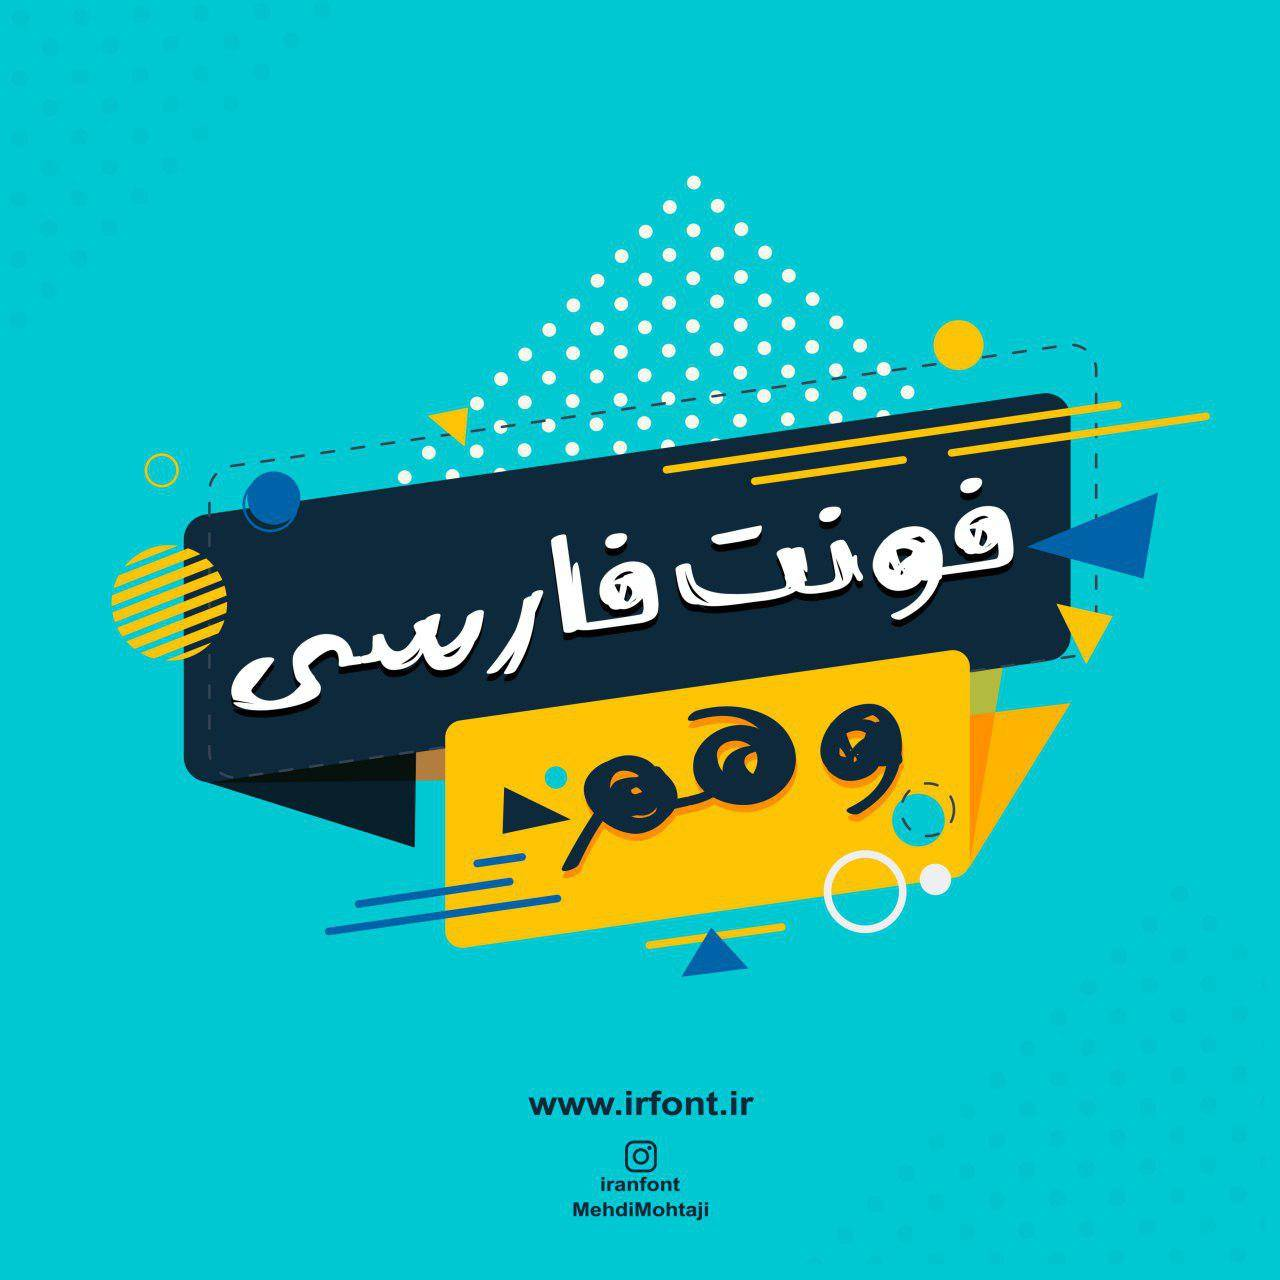 دانلود نسخه فارسی فونت وهم | WahmTypeface